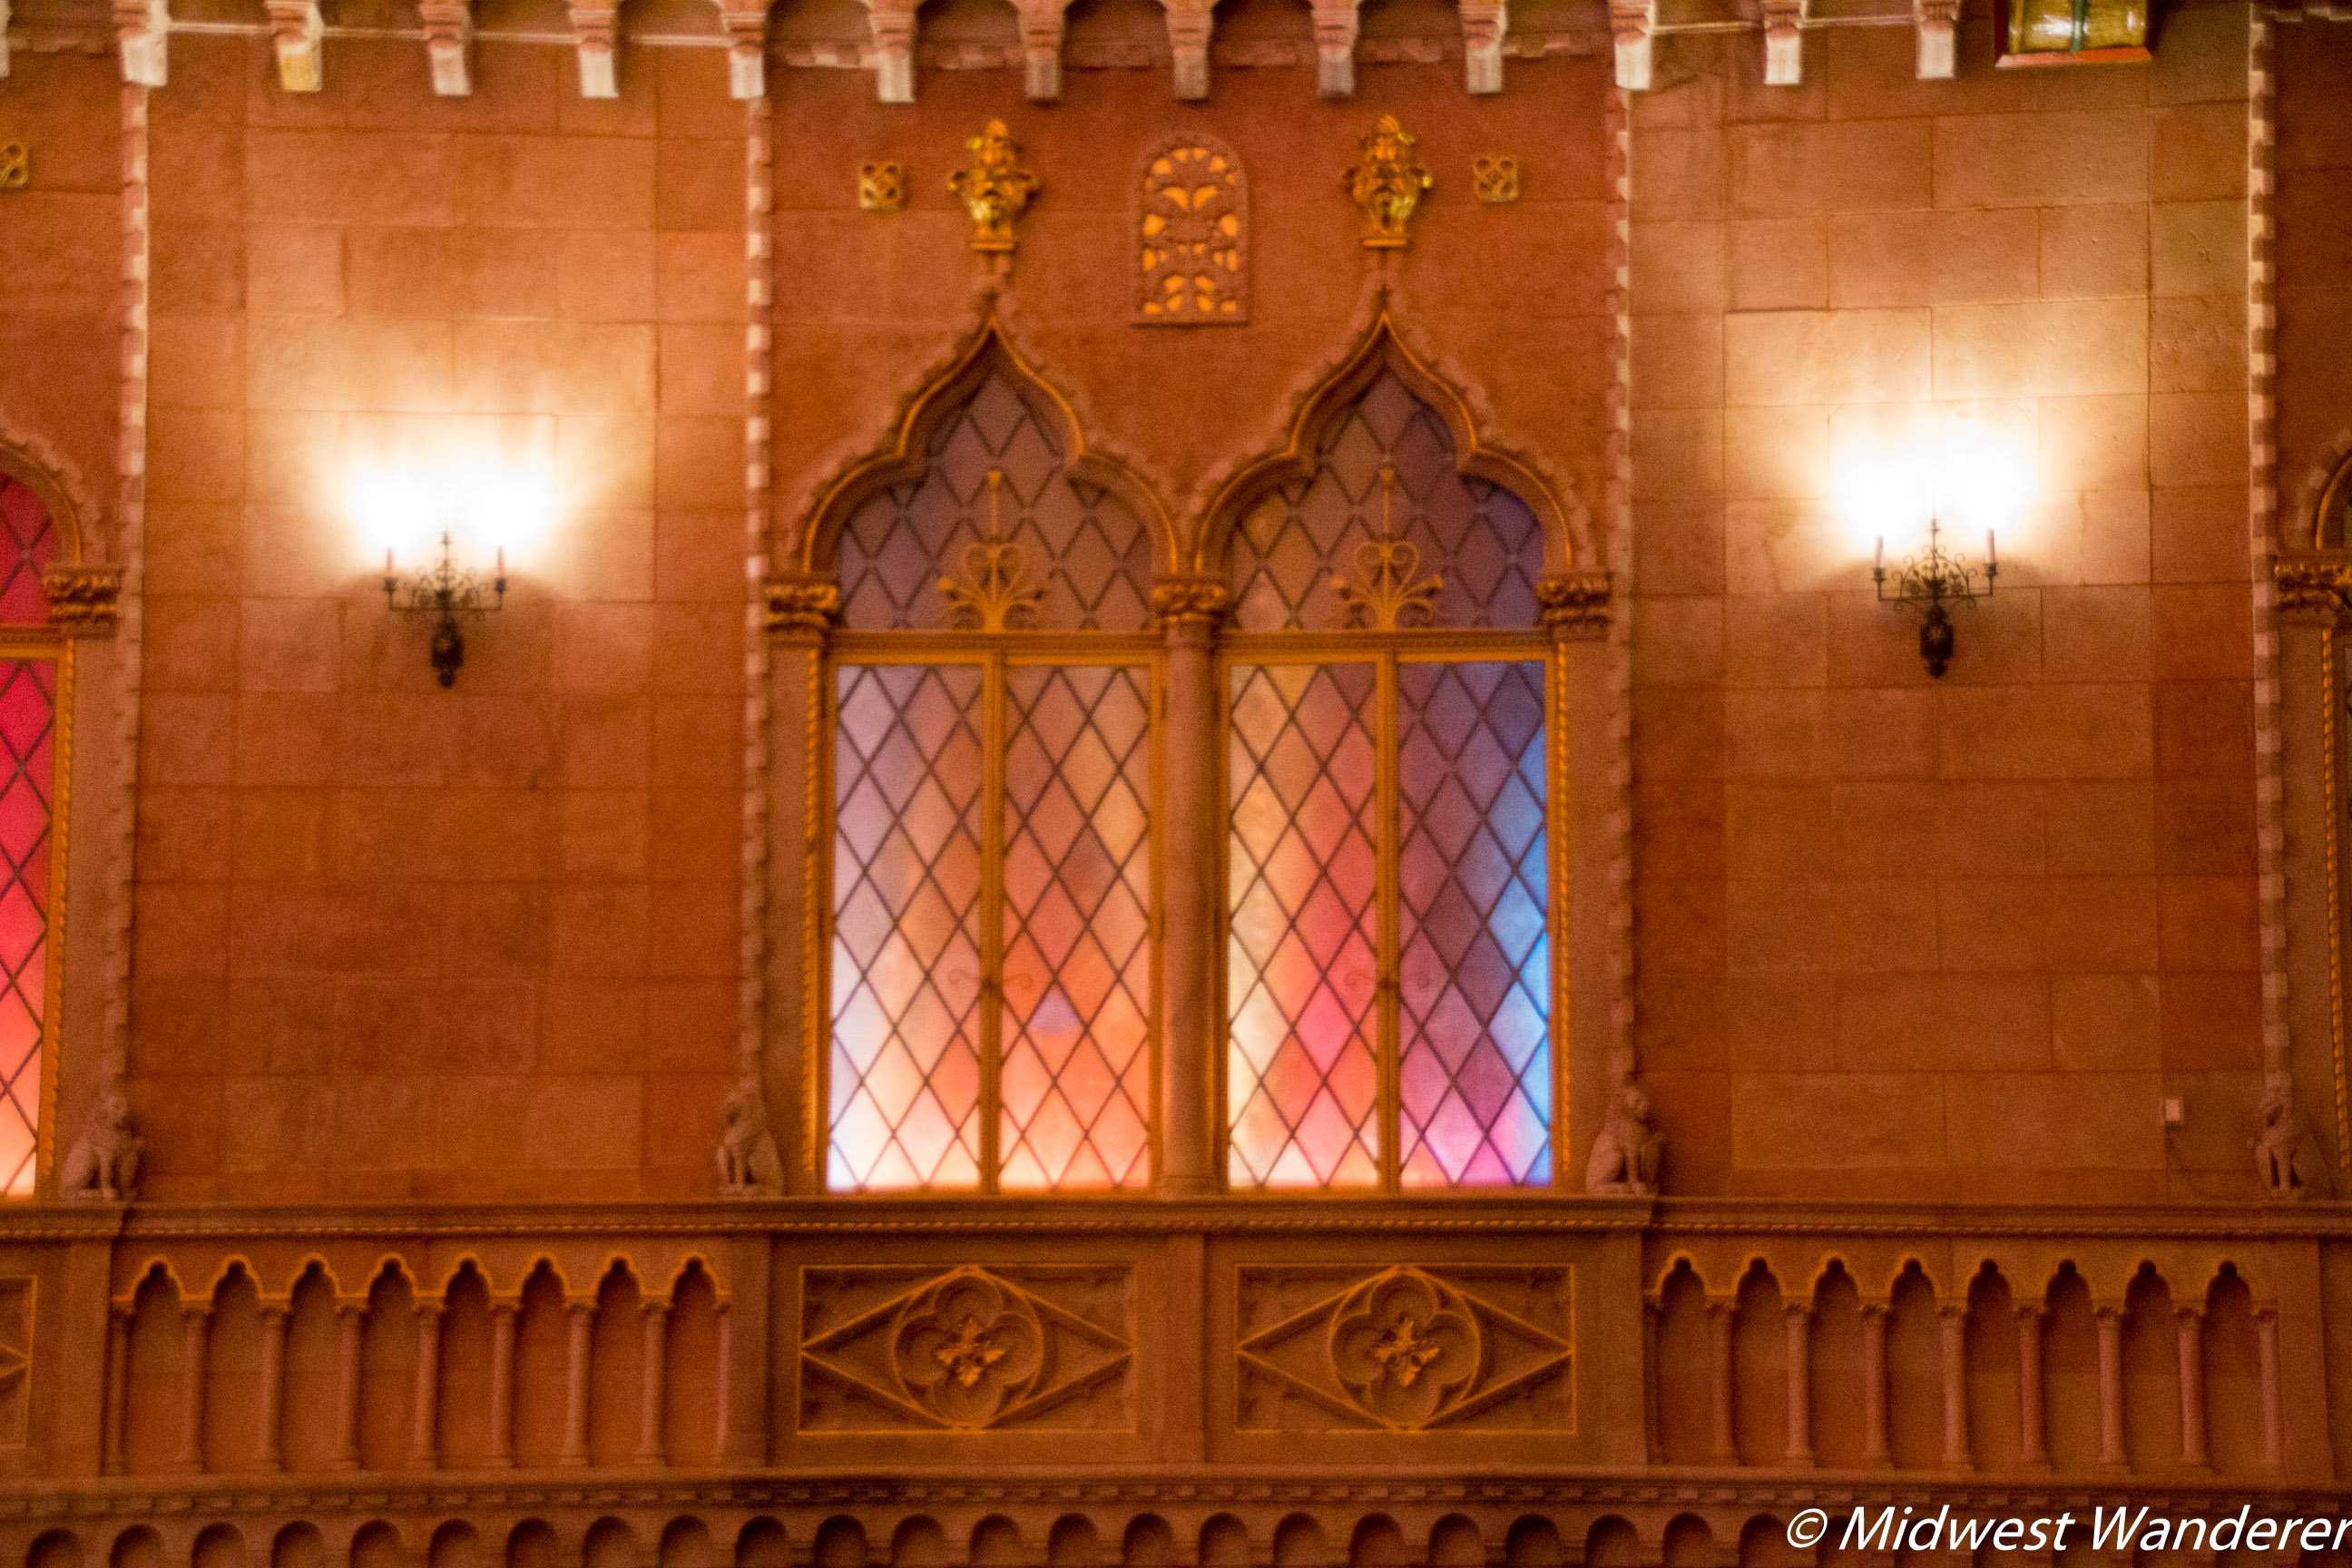 Hershey Theatre windows